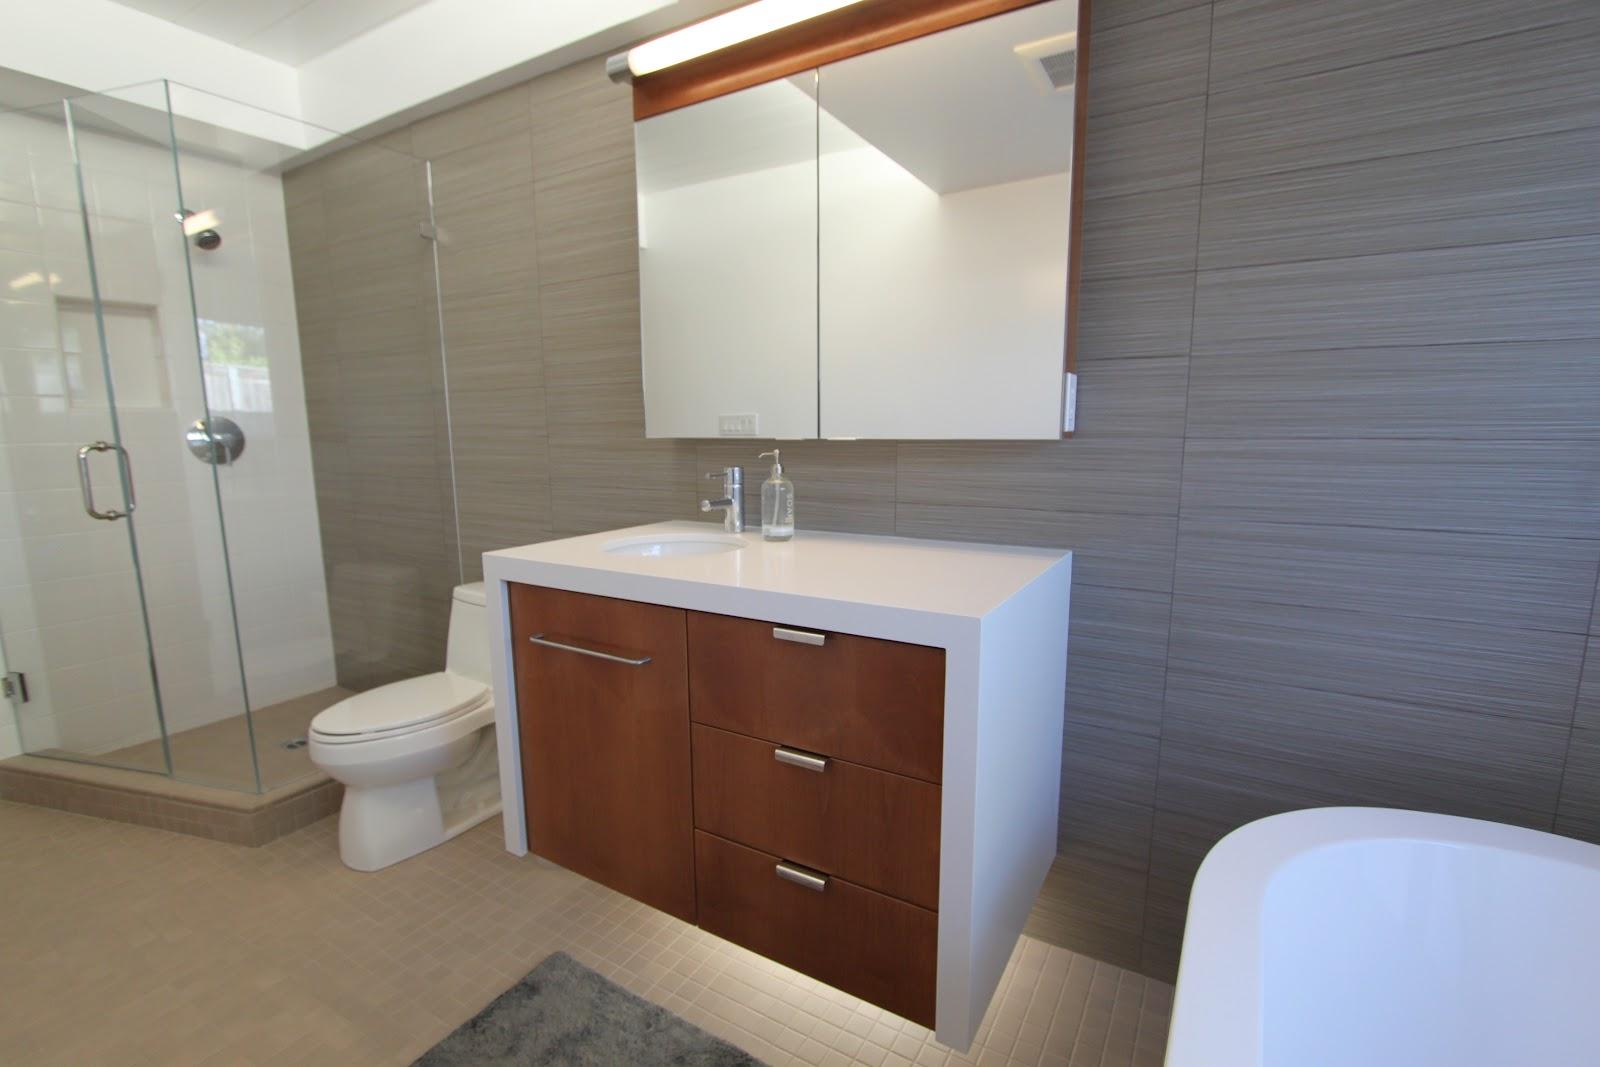 3 Mid Century Bathrooms Remodeled Mid Century Modern Remodel